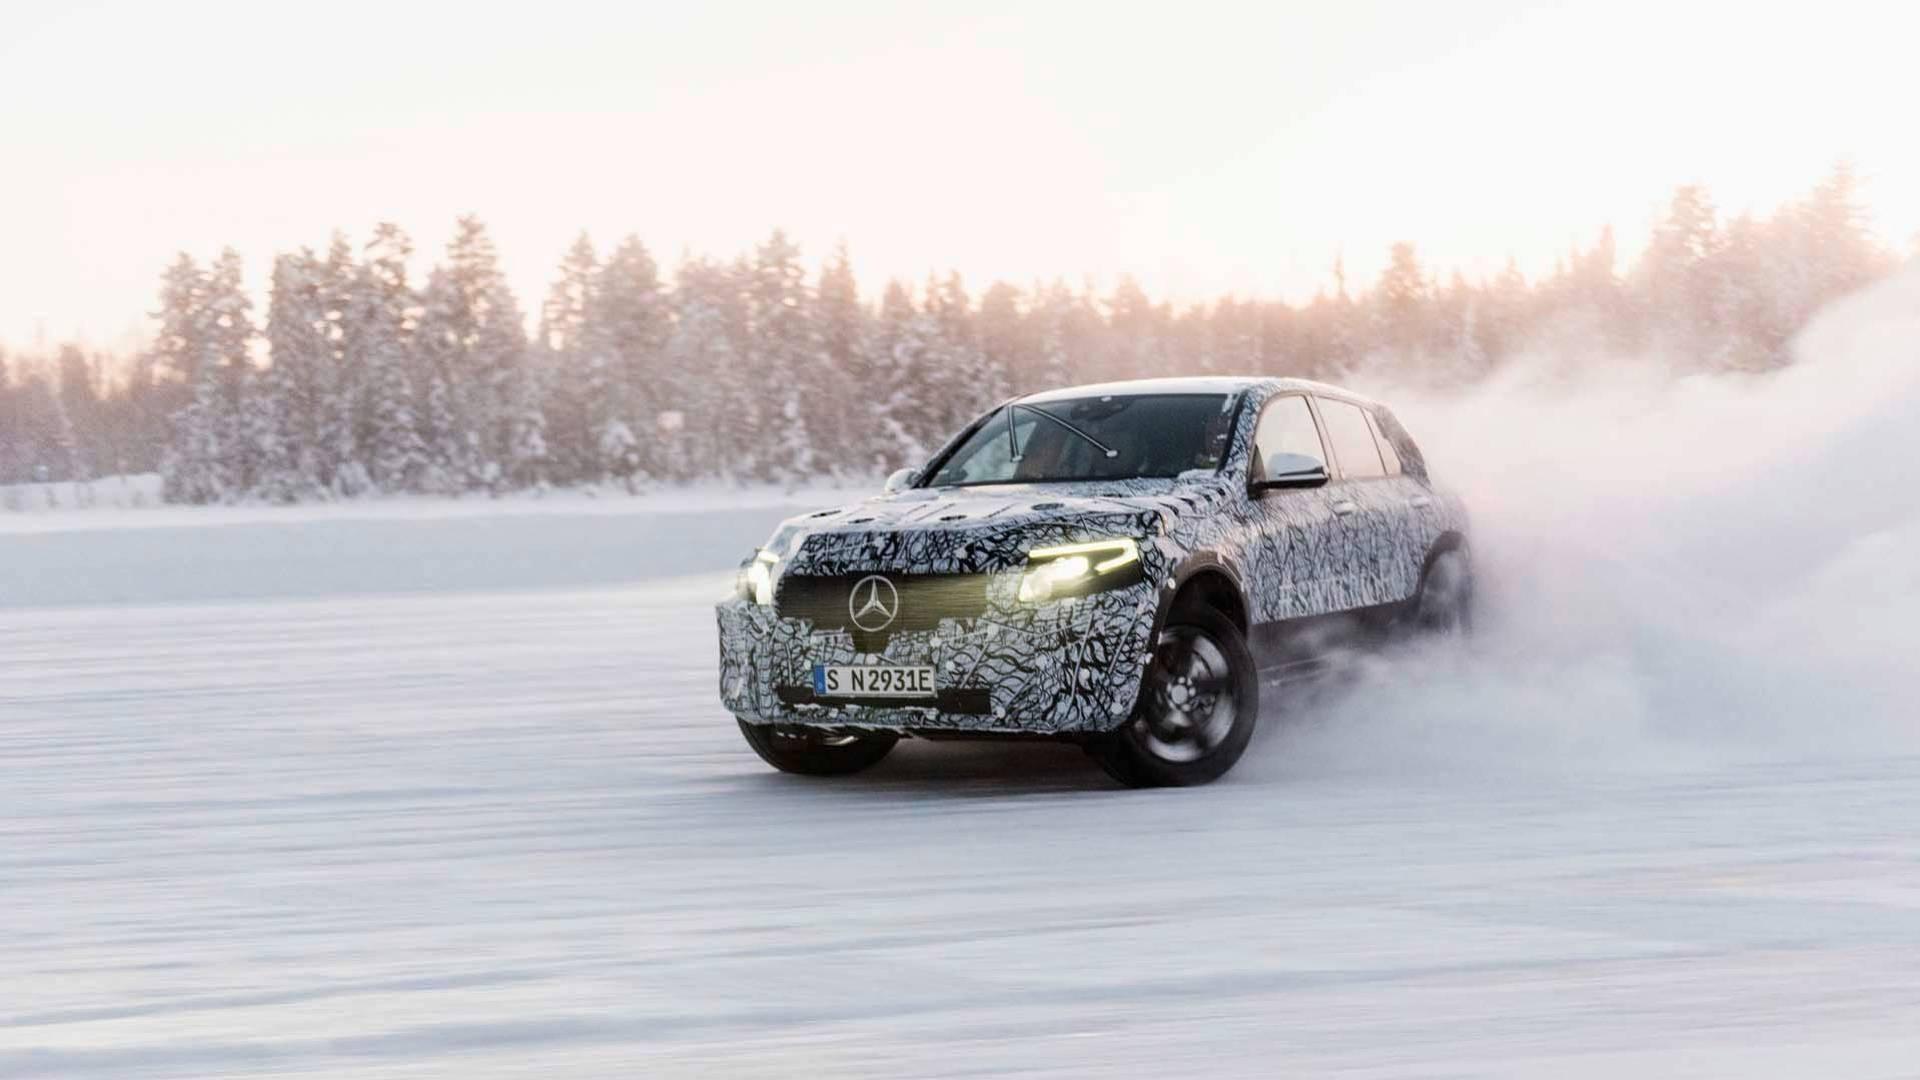 2019 Mercedes Benz Eqc Electric Suv Prototype Completes